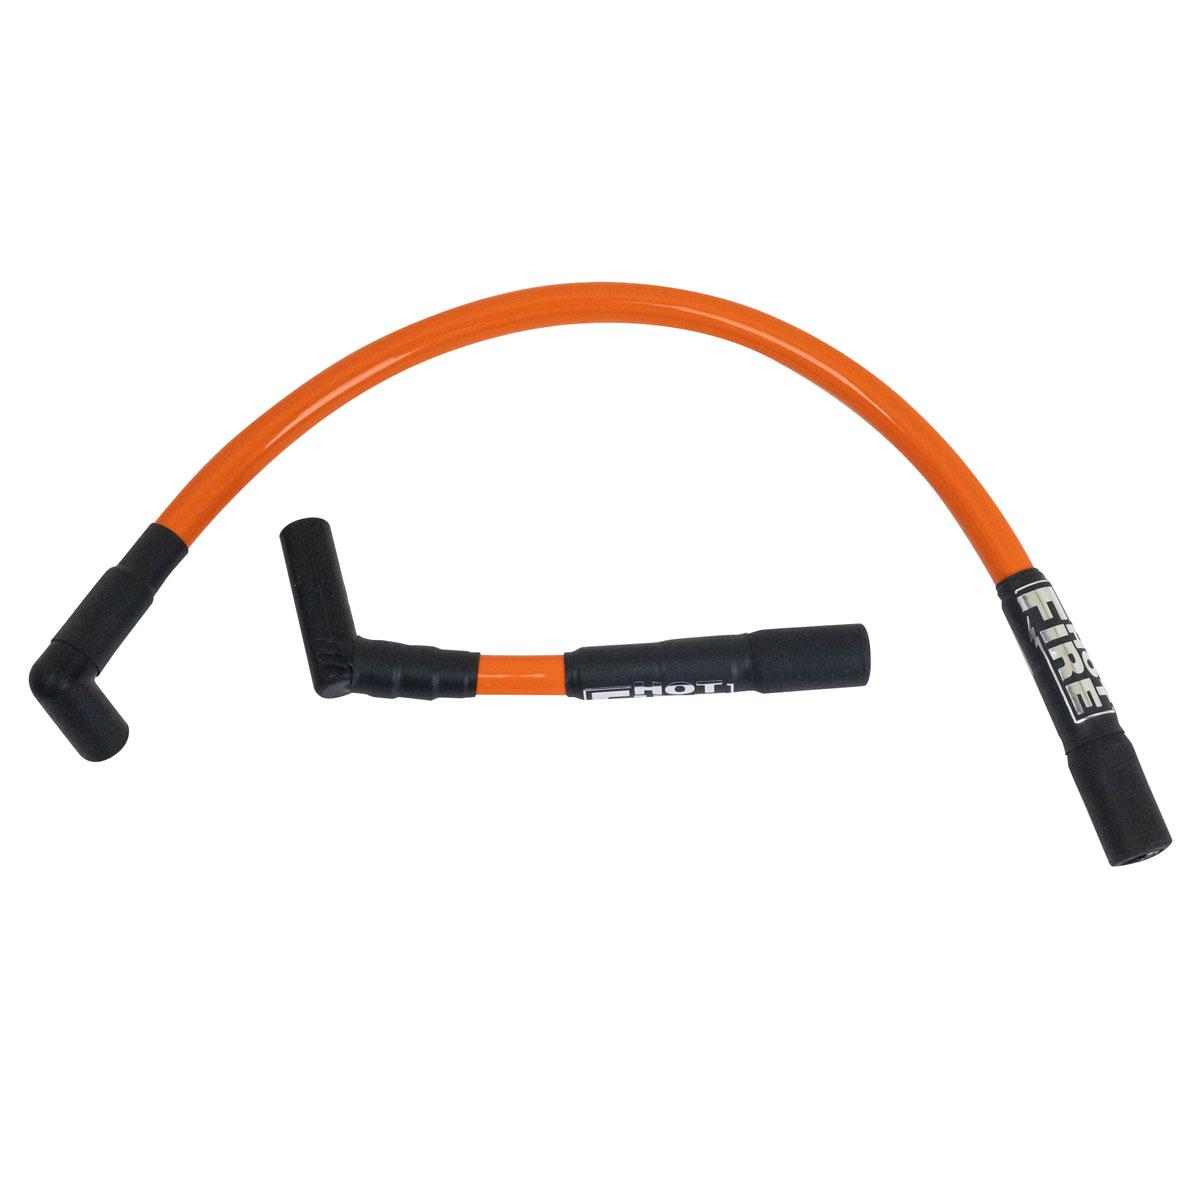 Hot Fire Orange Spark Plug Wire Set - SPC1ORANGE Harley Plug Wires on